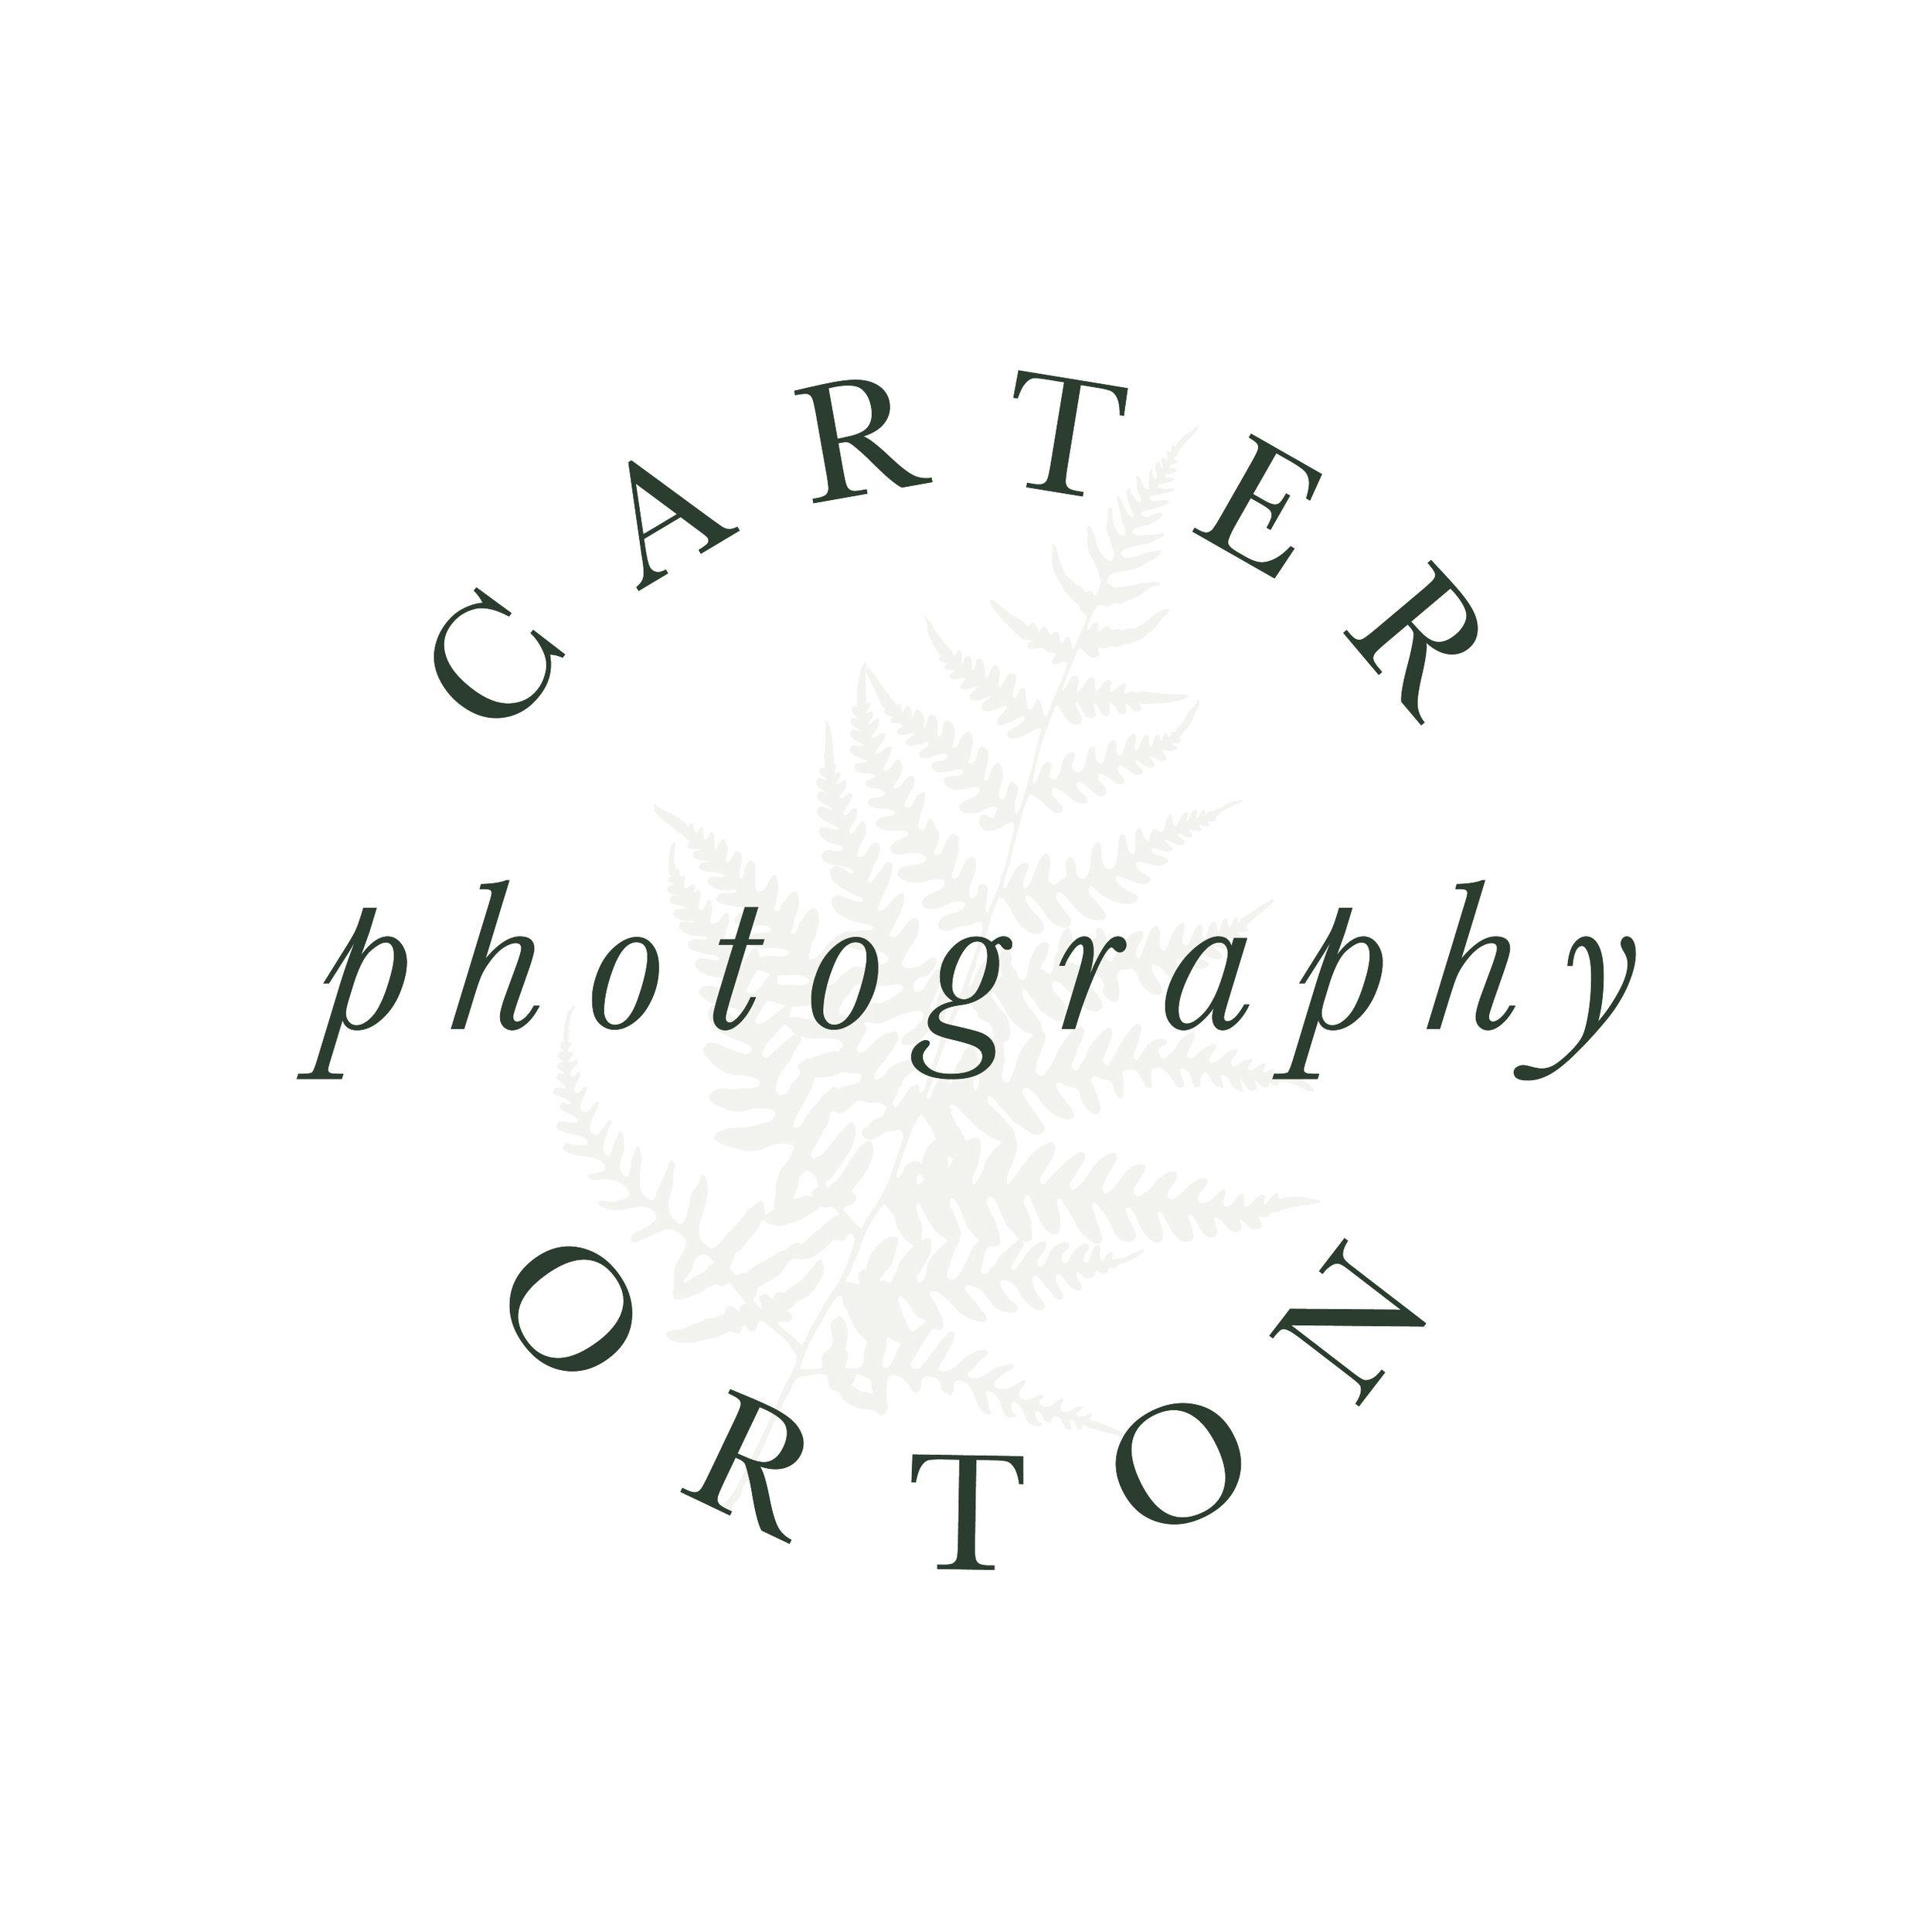 01_carter_orton_photography_rebrand_manual-12.jpg